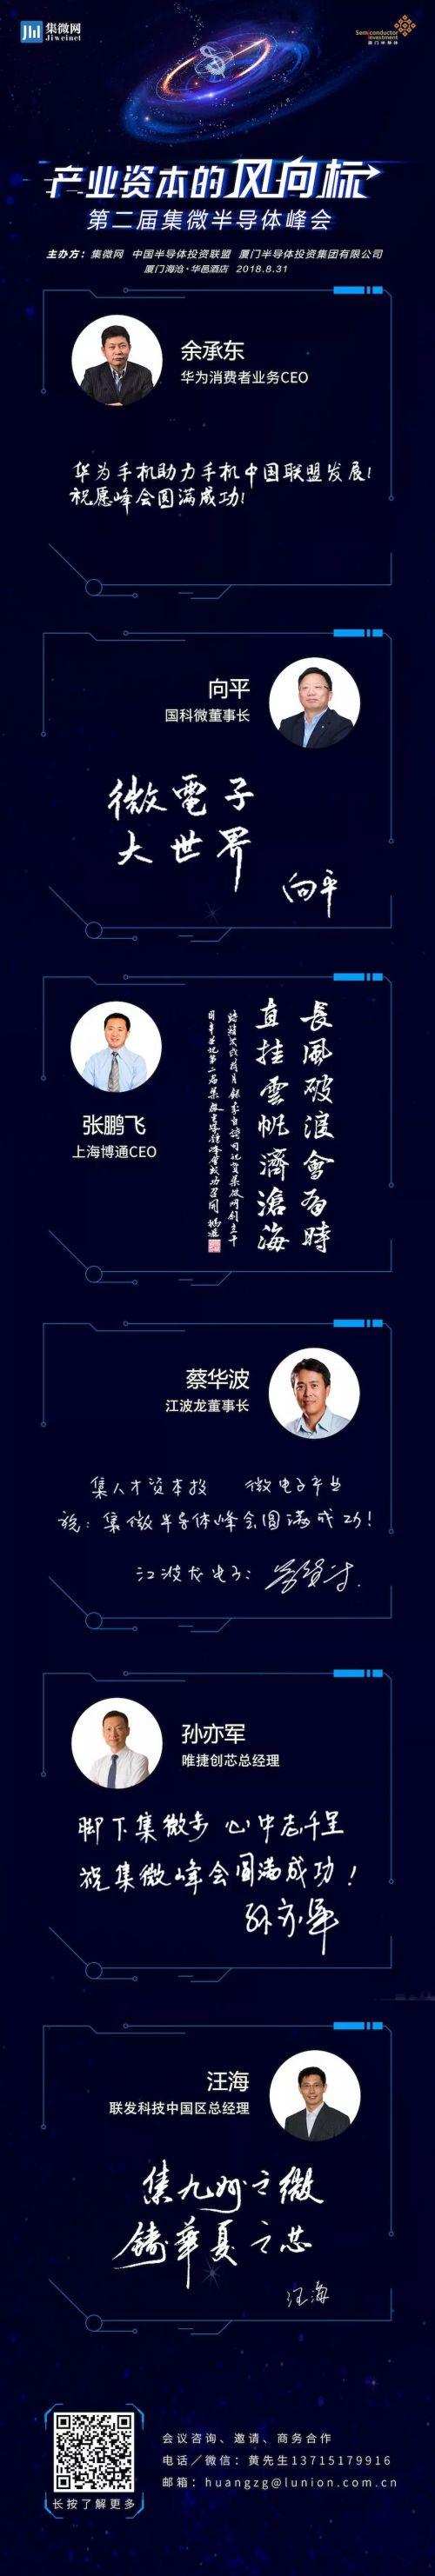 Arm吴雄昂、黄汪、石磊、张世龙、林永育寄语峰会11